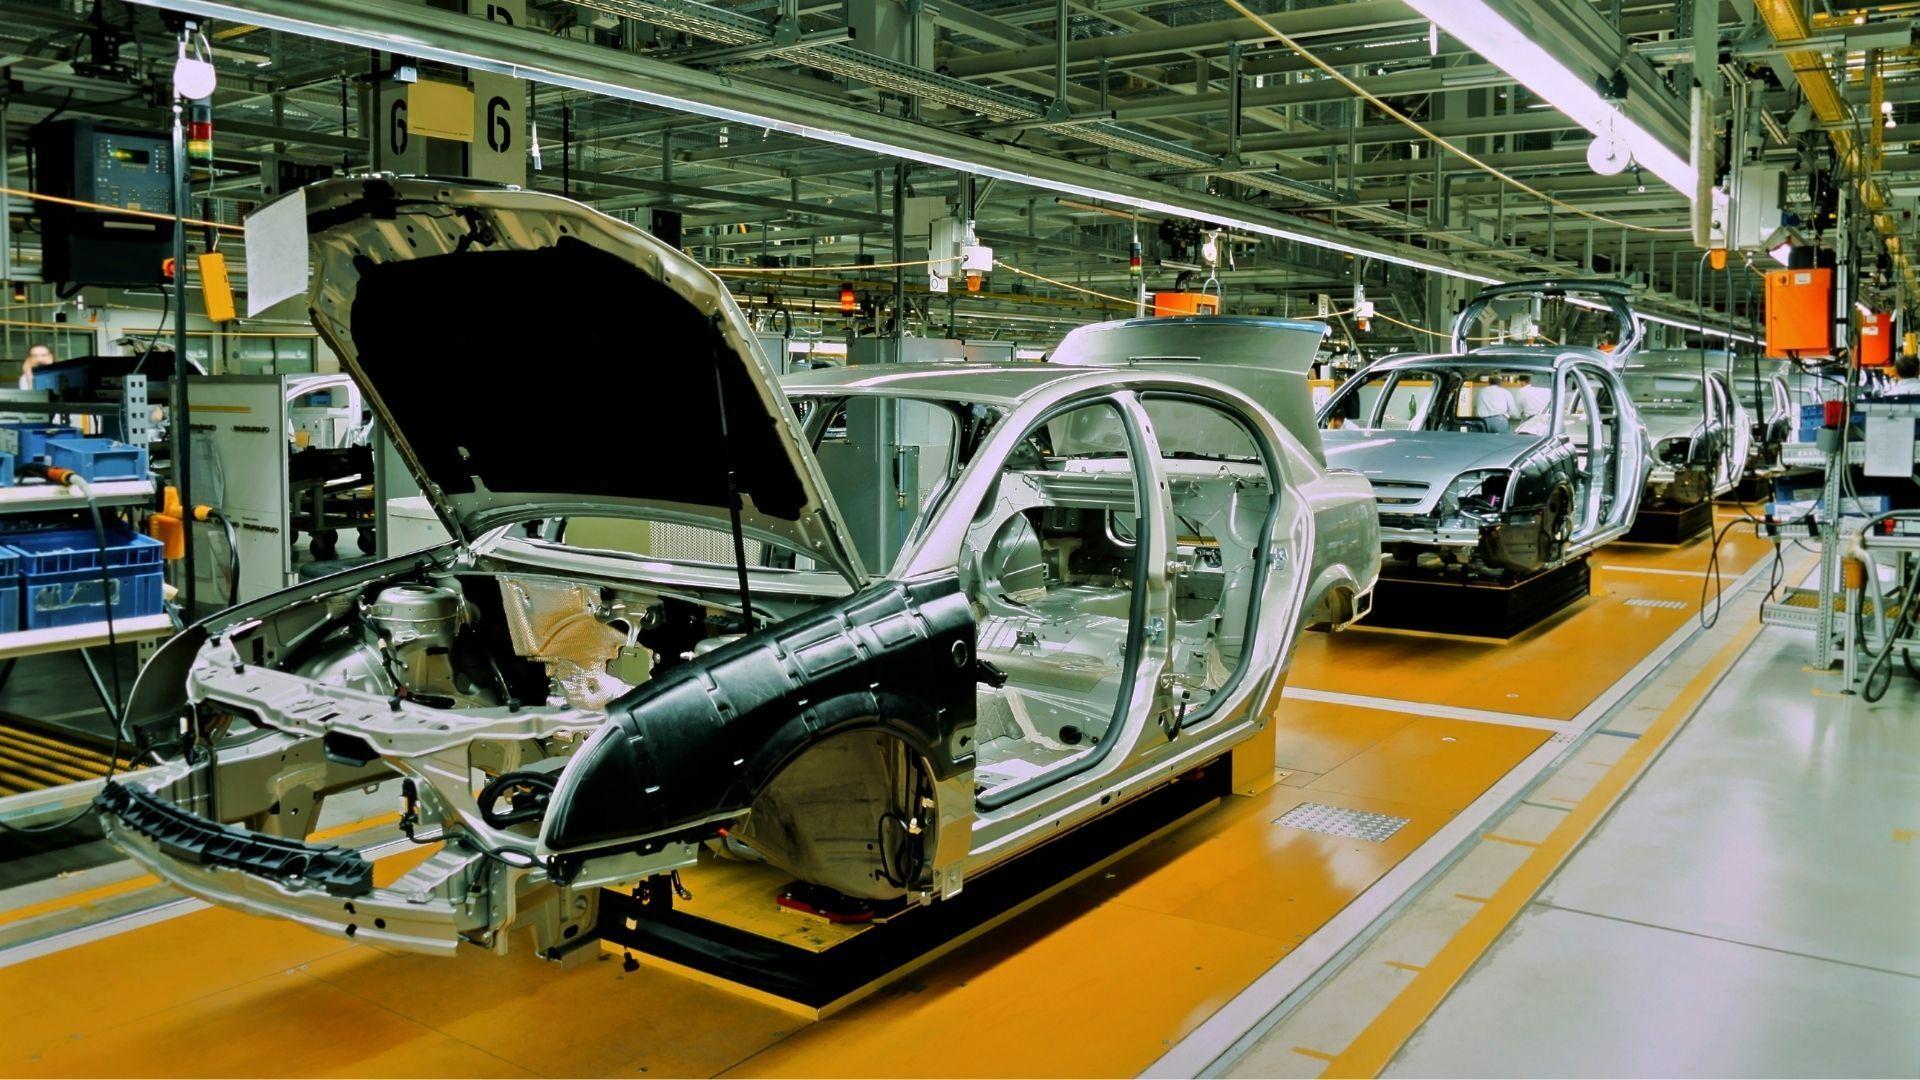 【Gunma, Ota】Hiring Automotive Manufacturing Staff